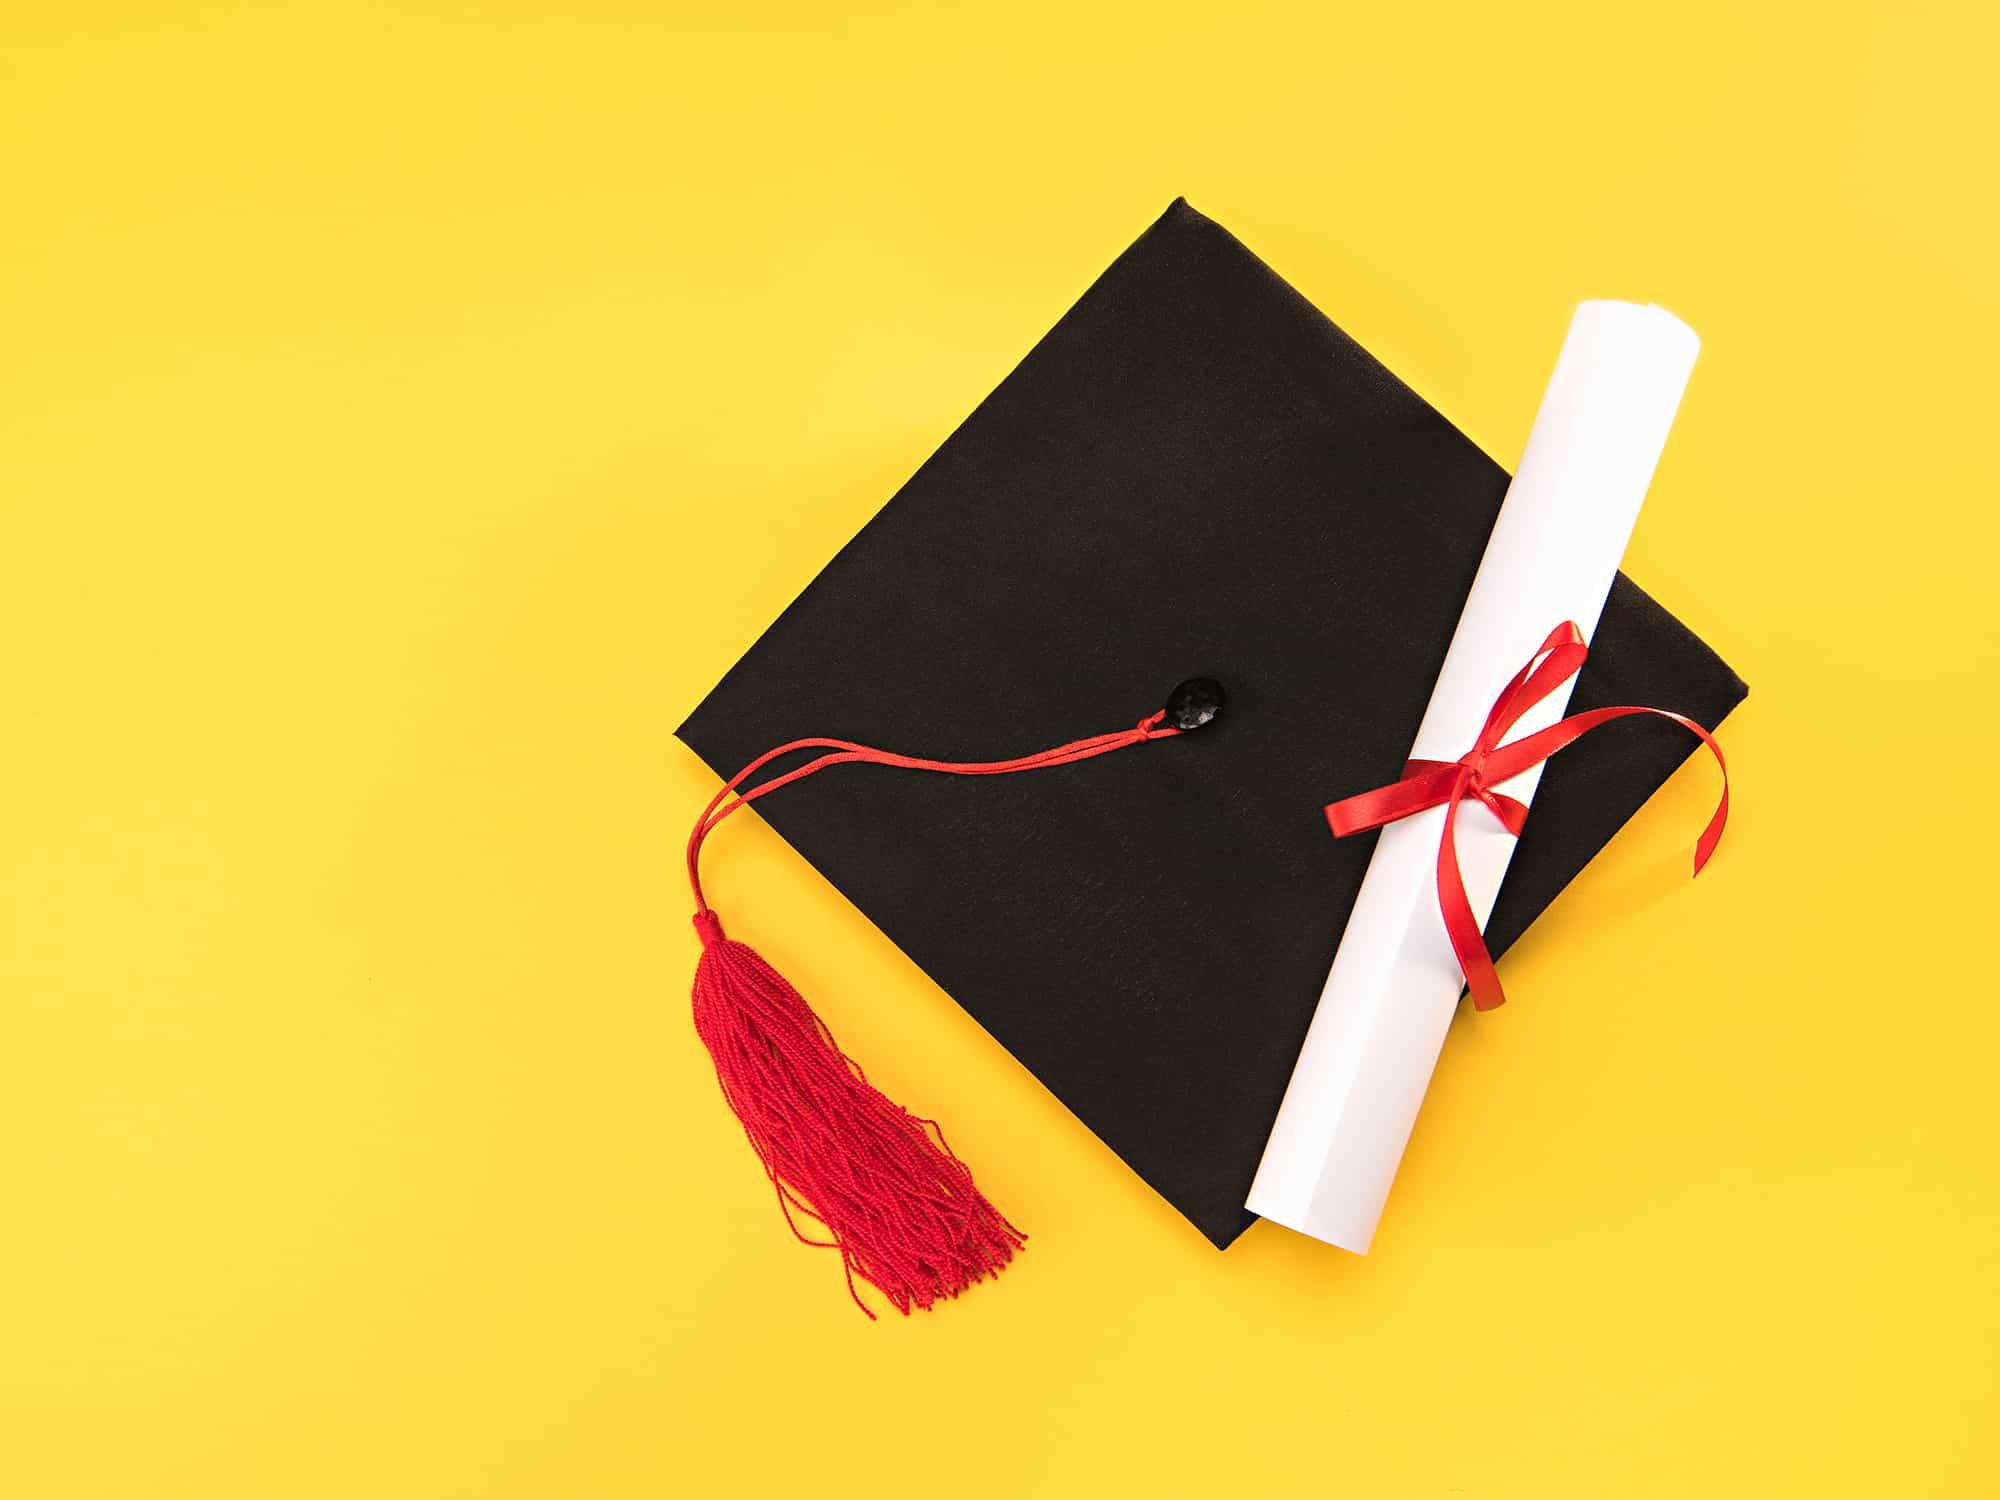 Golden Proportions Marketing Announces 2020 Scholarship Winner